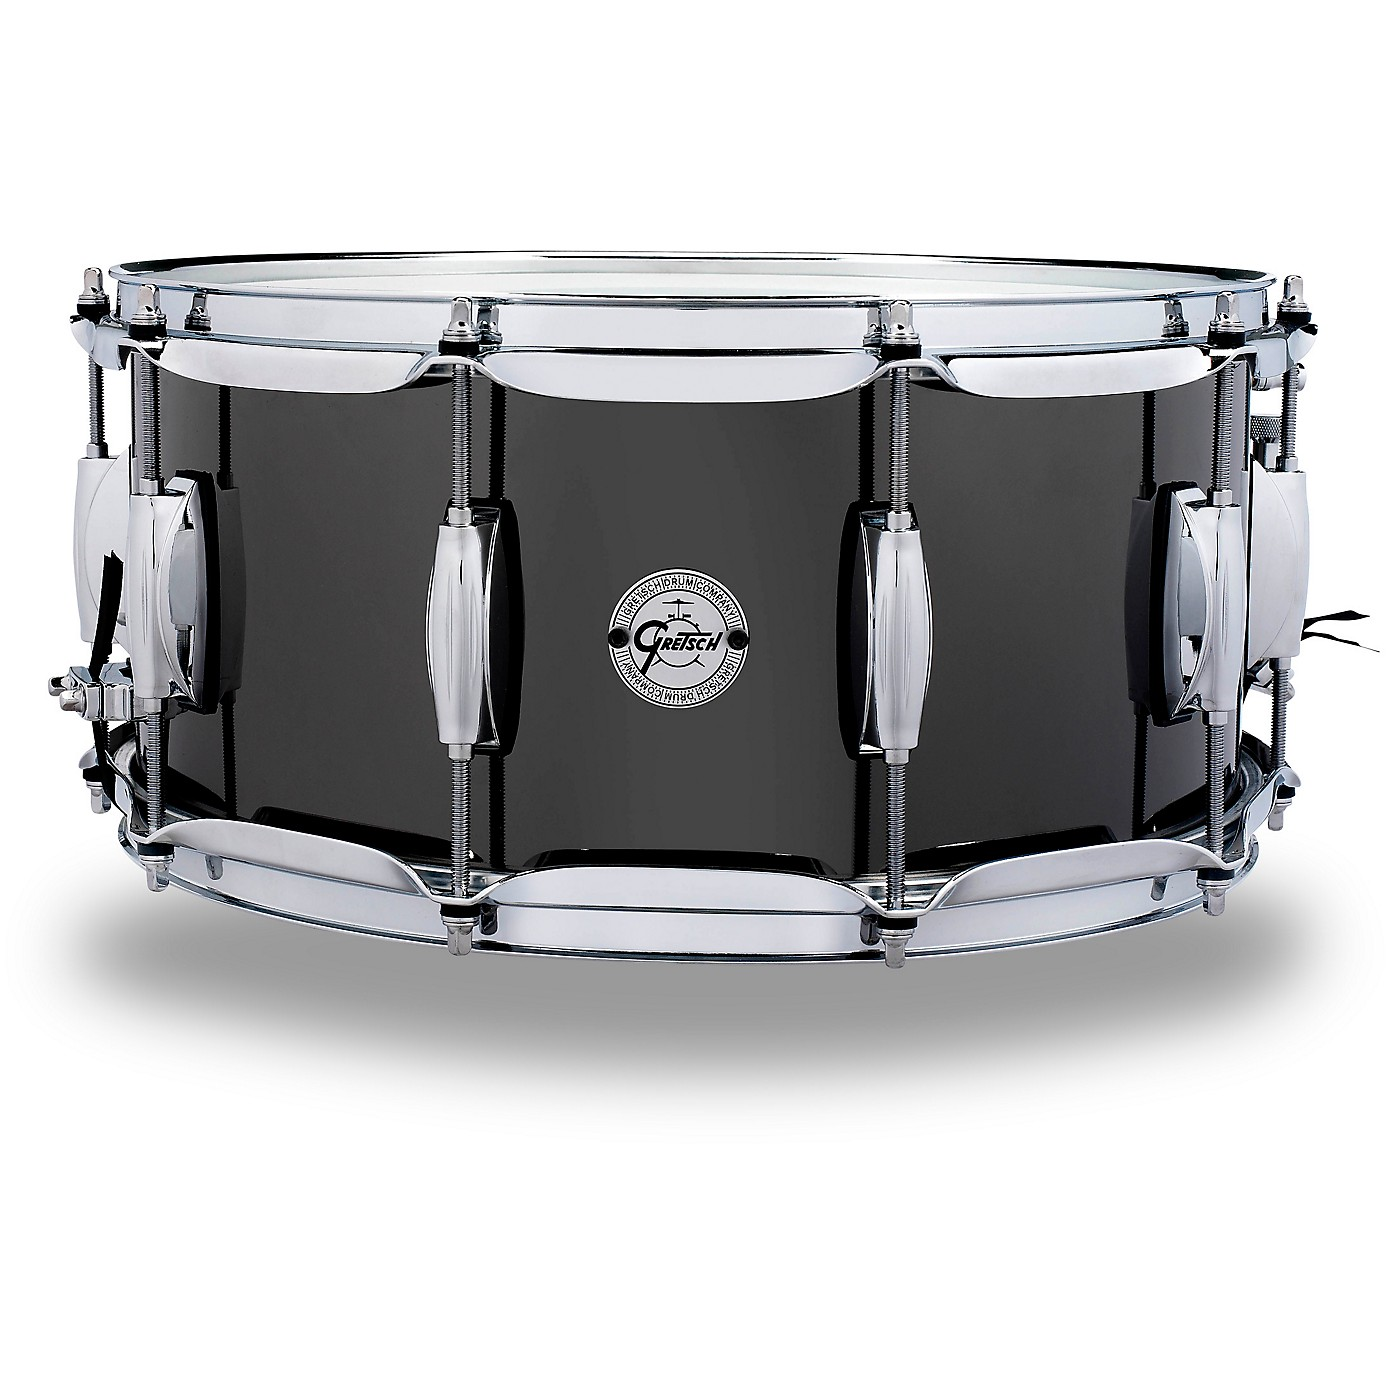 Gretsch Drums Black Nickel Over Steel Snare Drum thumbnail